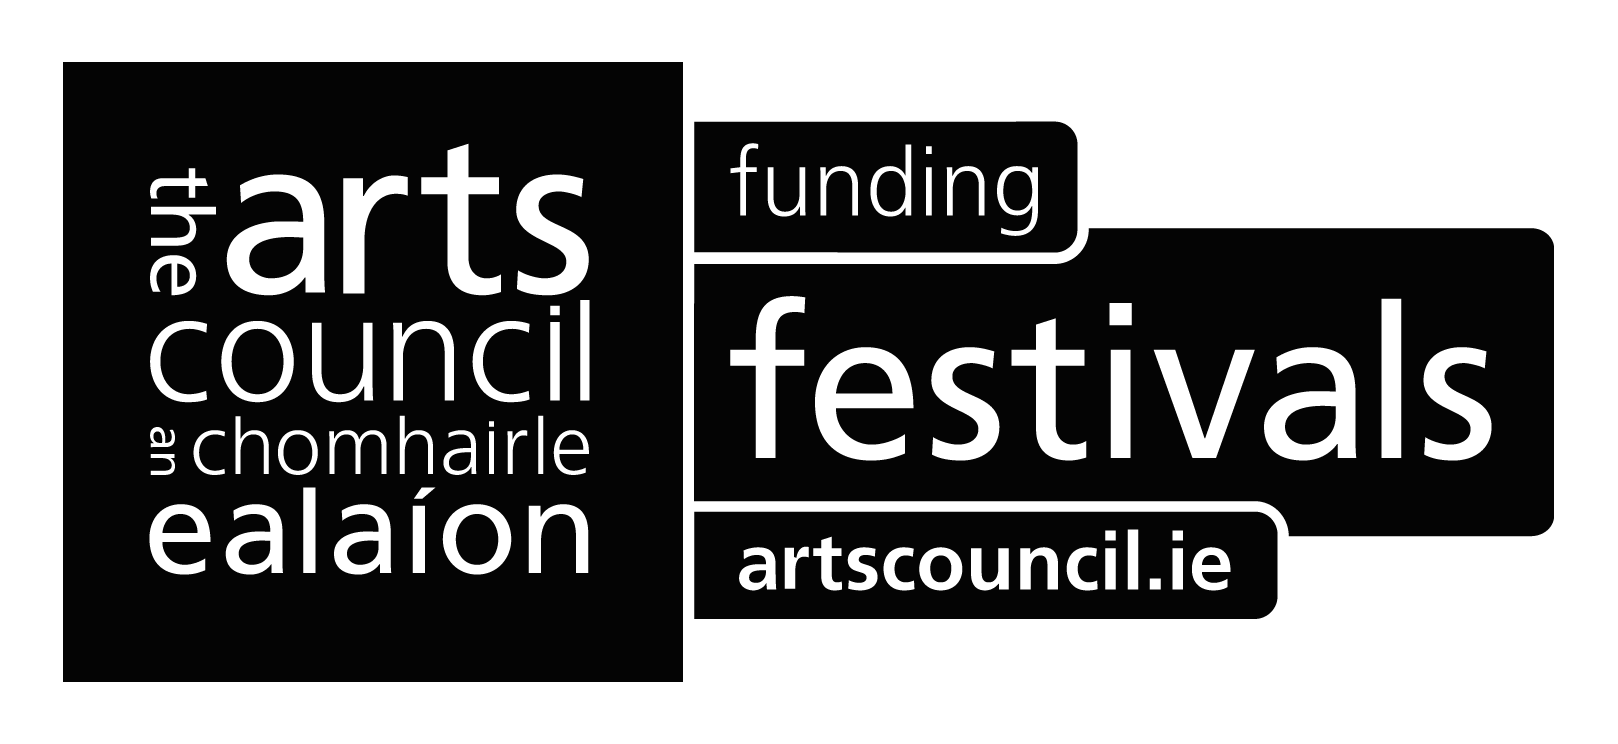 Arts Council of Ireland